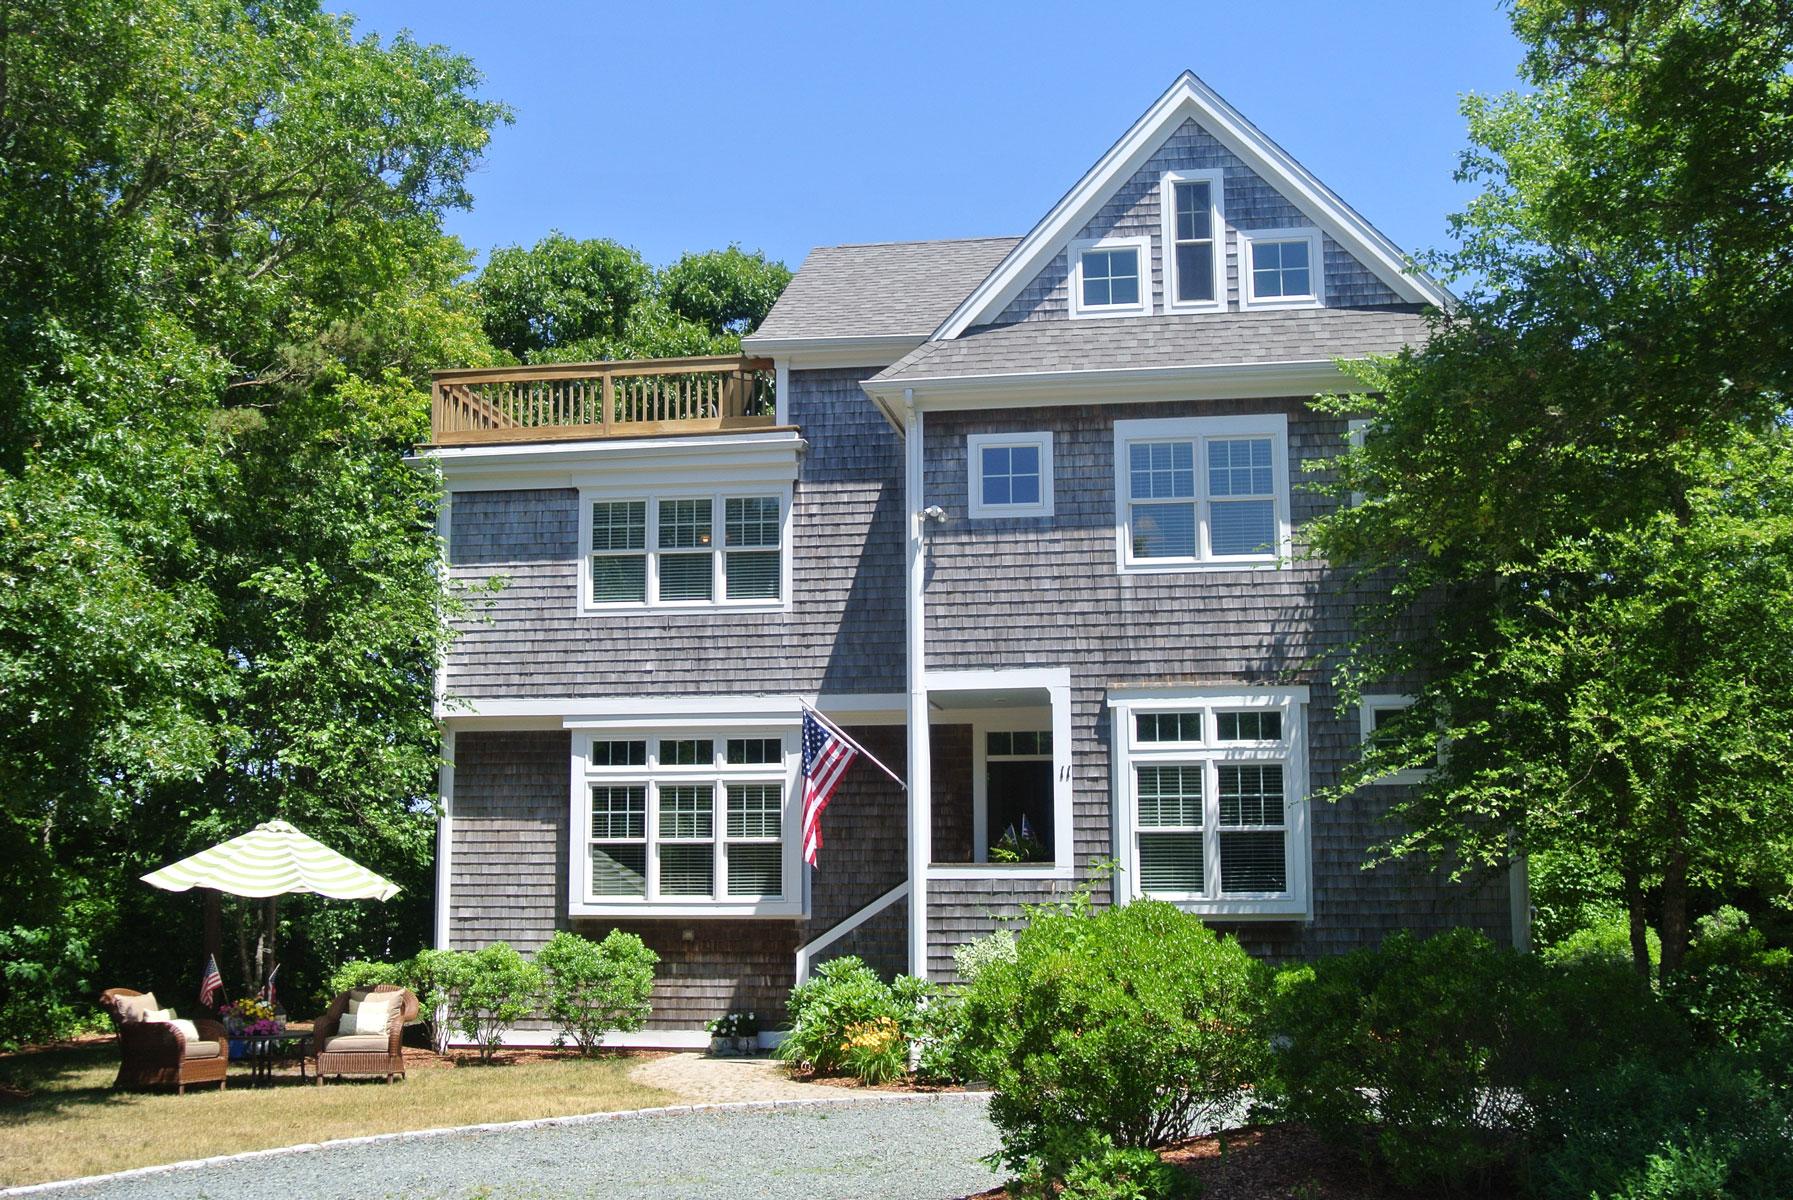 Single Family Home for Sale at SOUTH CAPE BEACH 11 Pontiac Road Mashpee, Massachusetts, 02649 United States